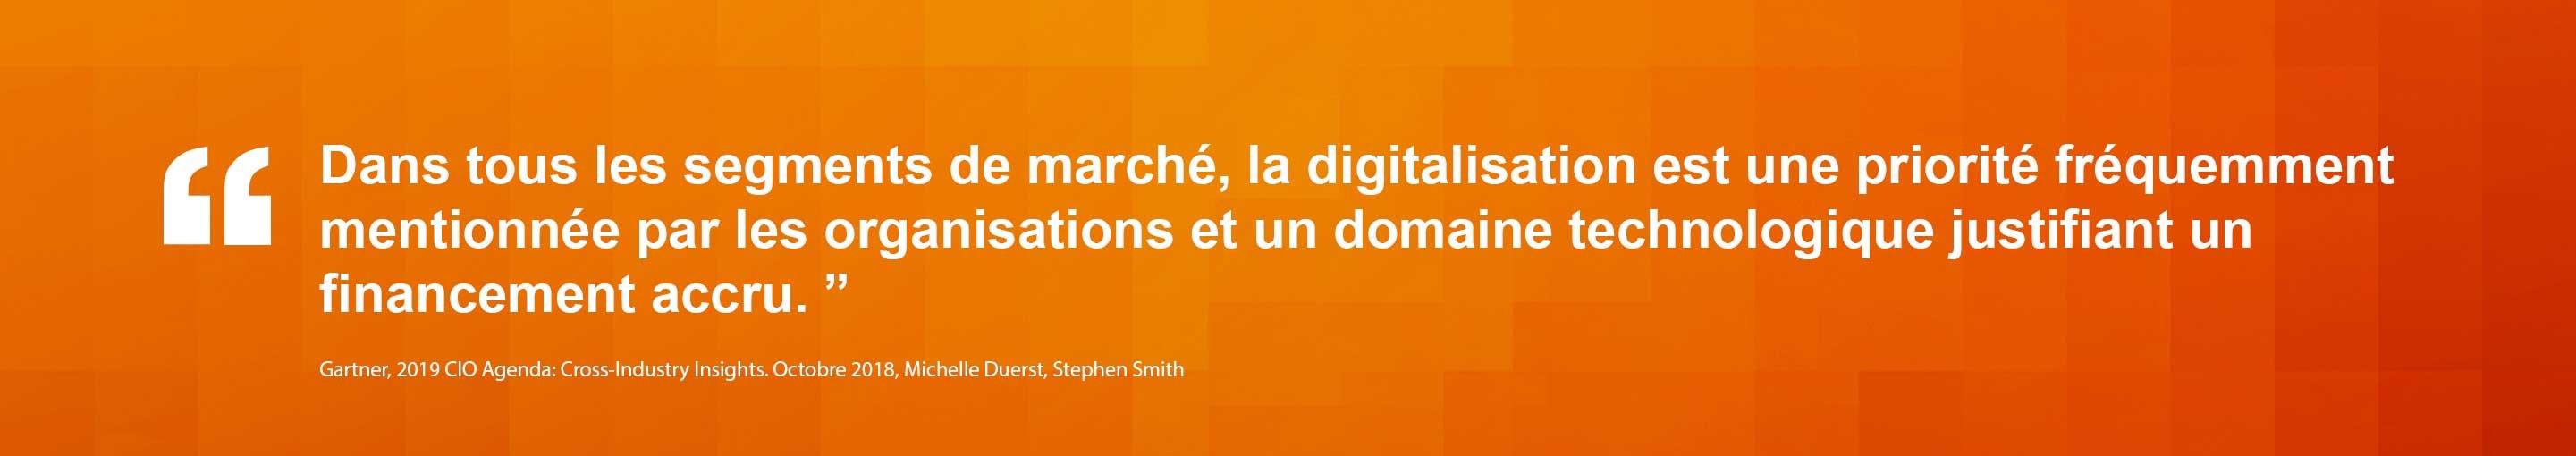 web_factoid_single_IT-Directors_FR